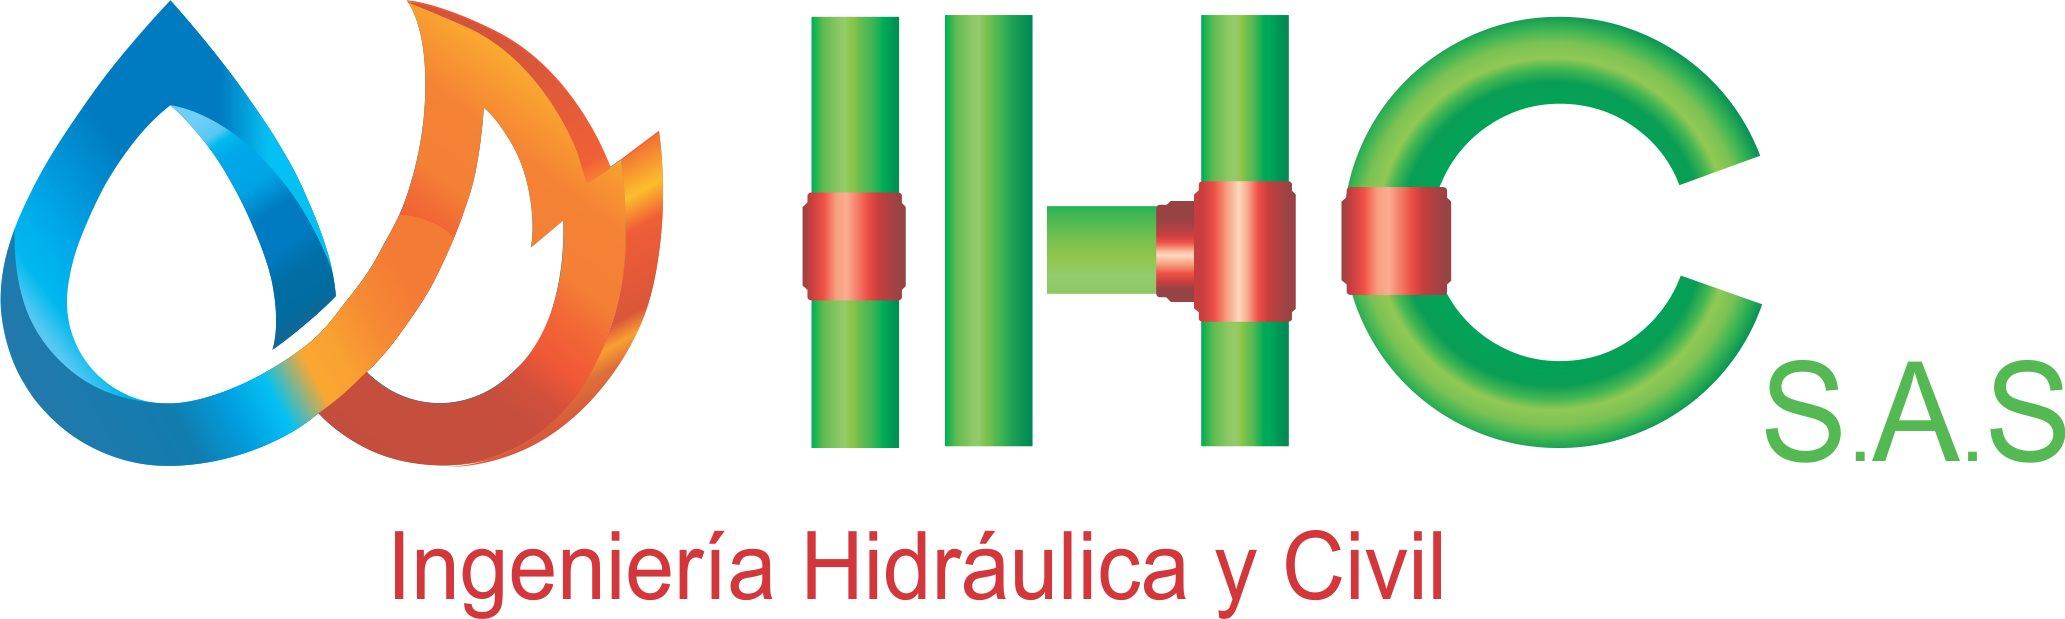 IHC SAS